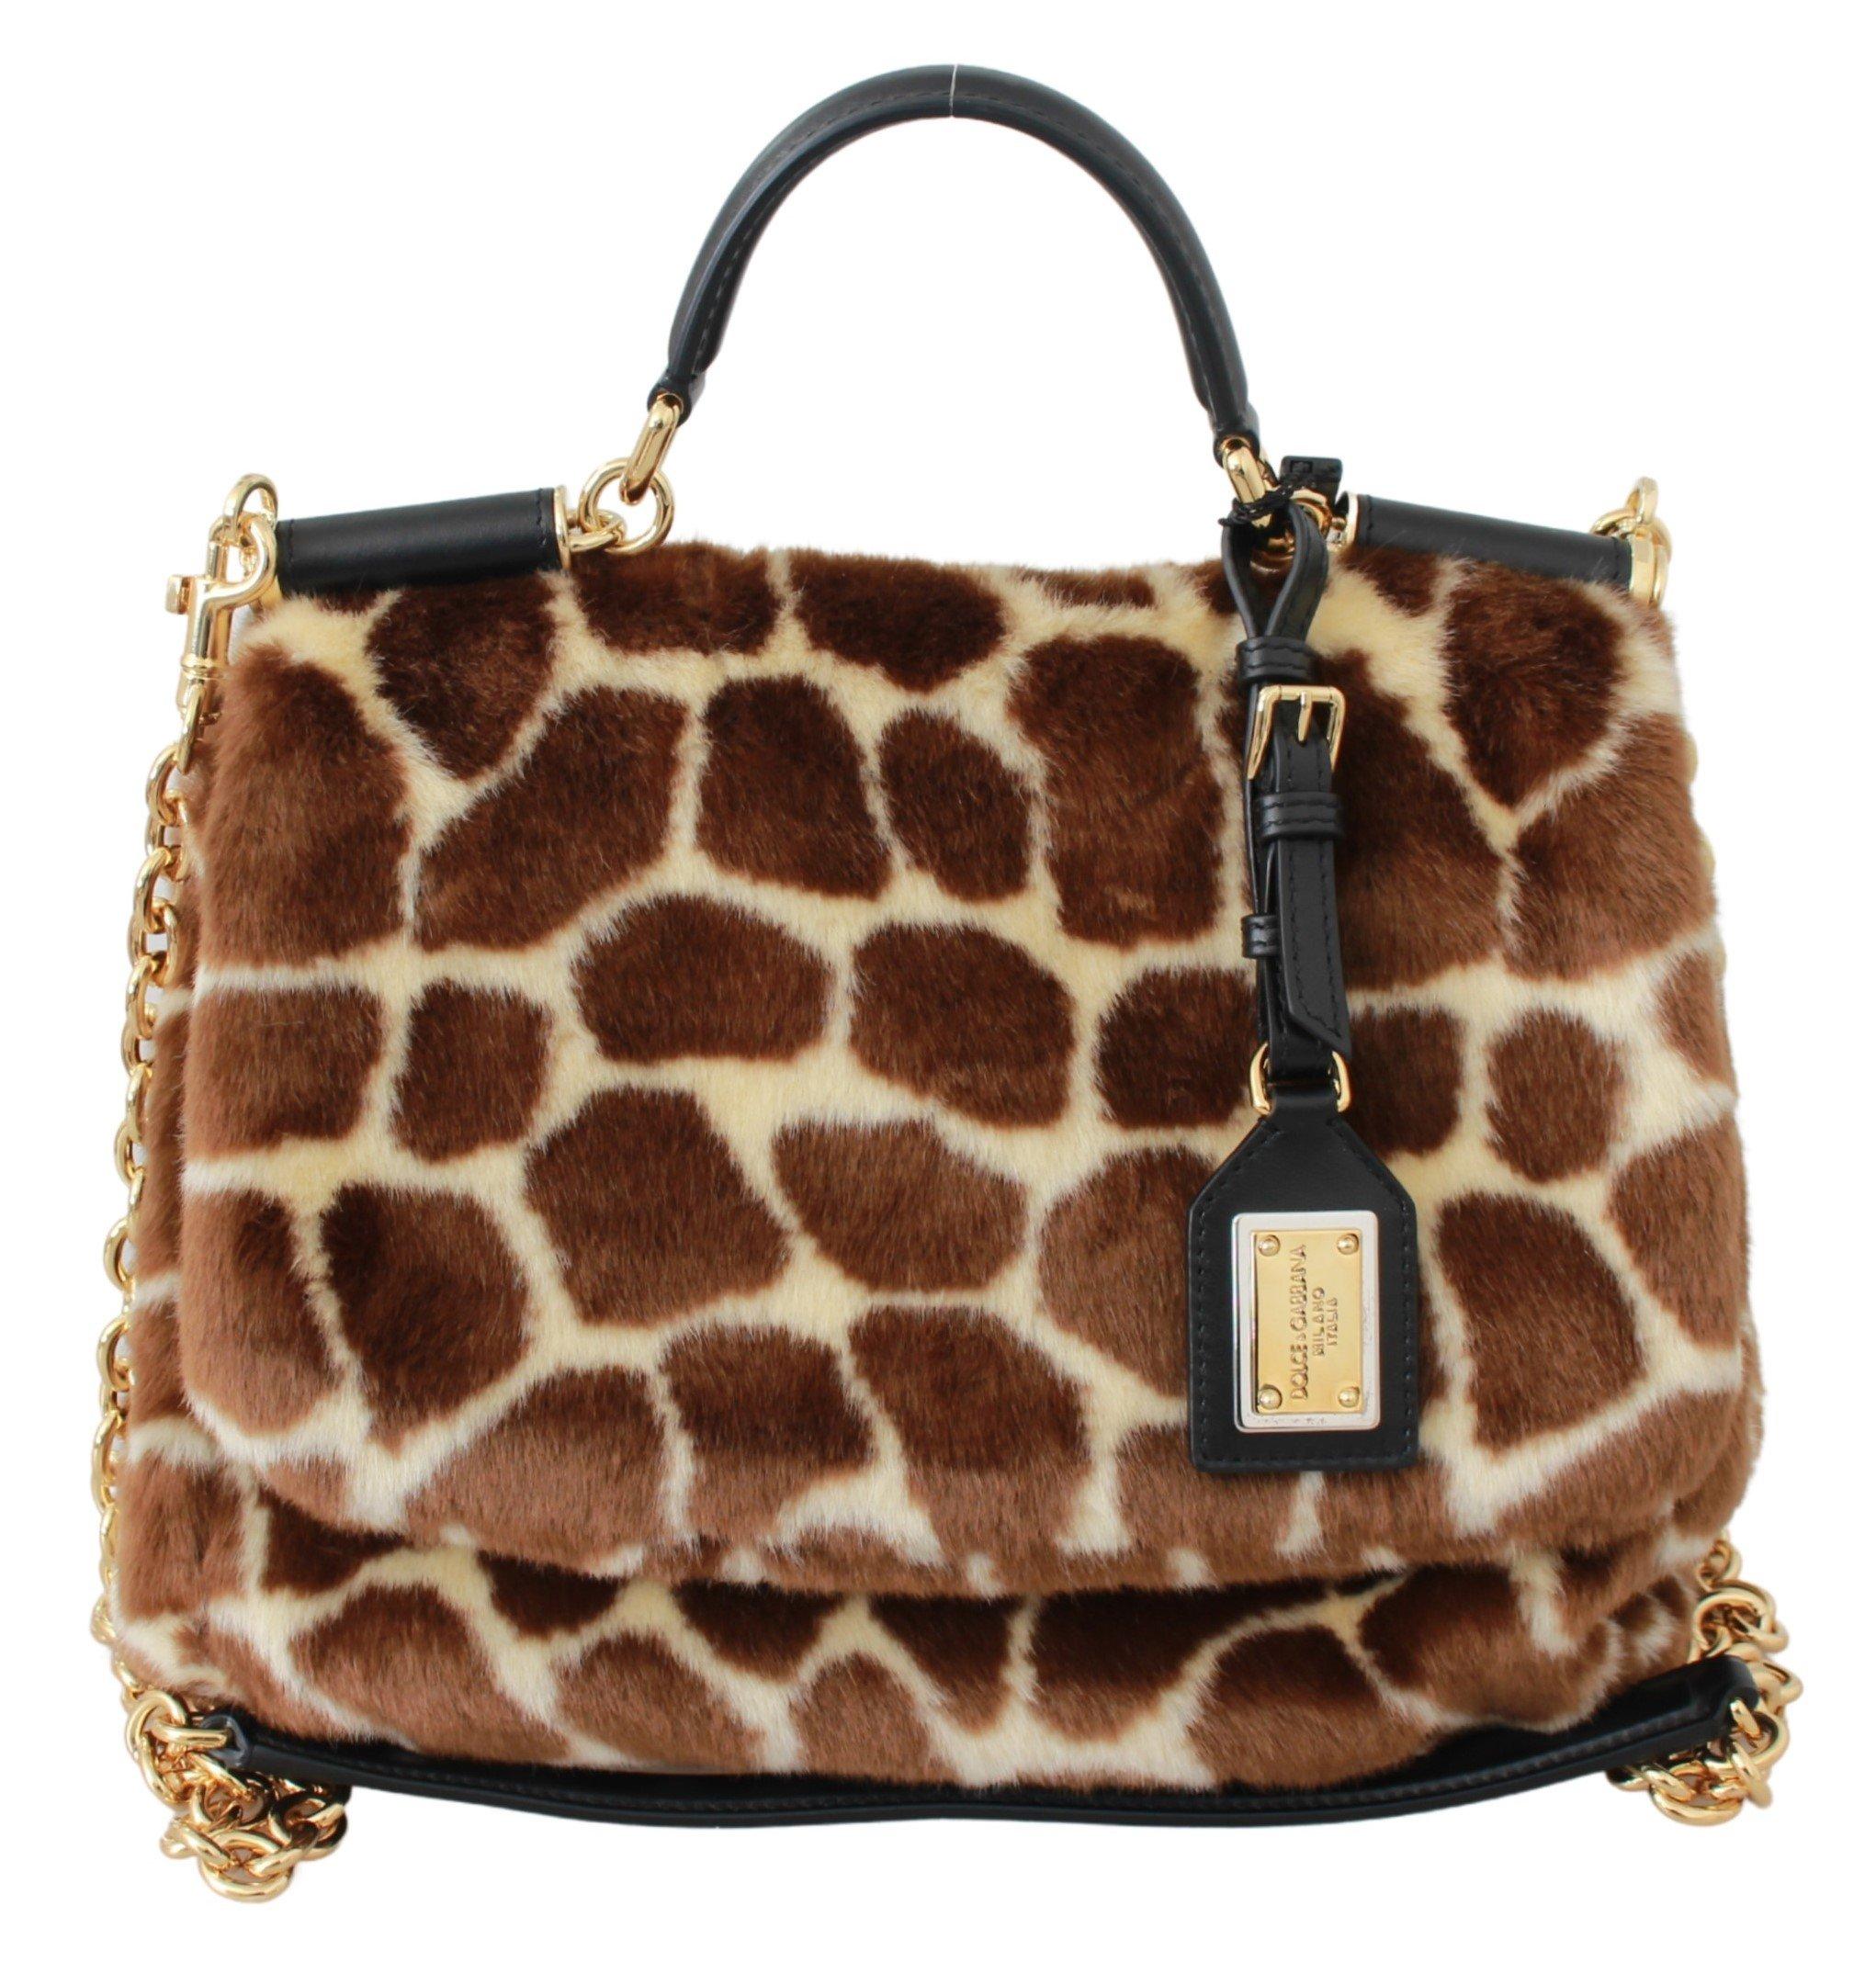 Dolce & Gabbana Women's MISS SICILY Giraffe Shoulder Bag Brown VAS9415